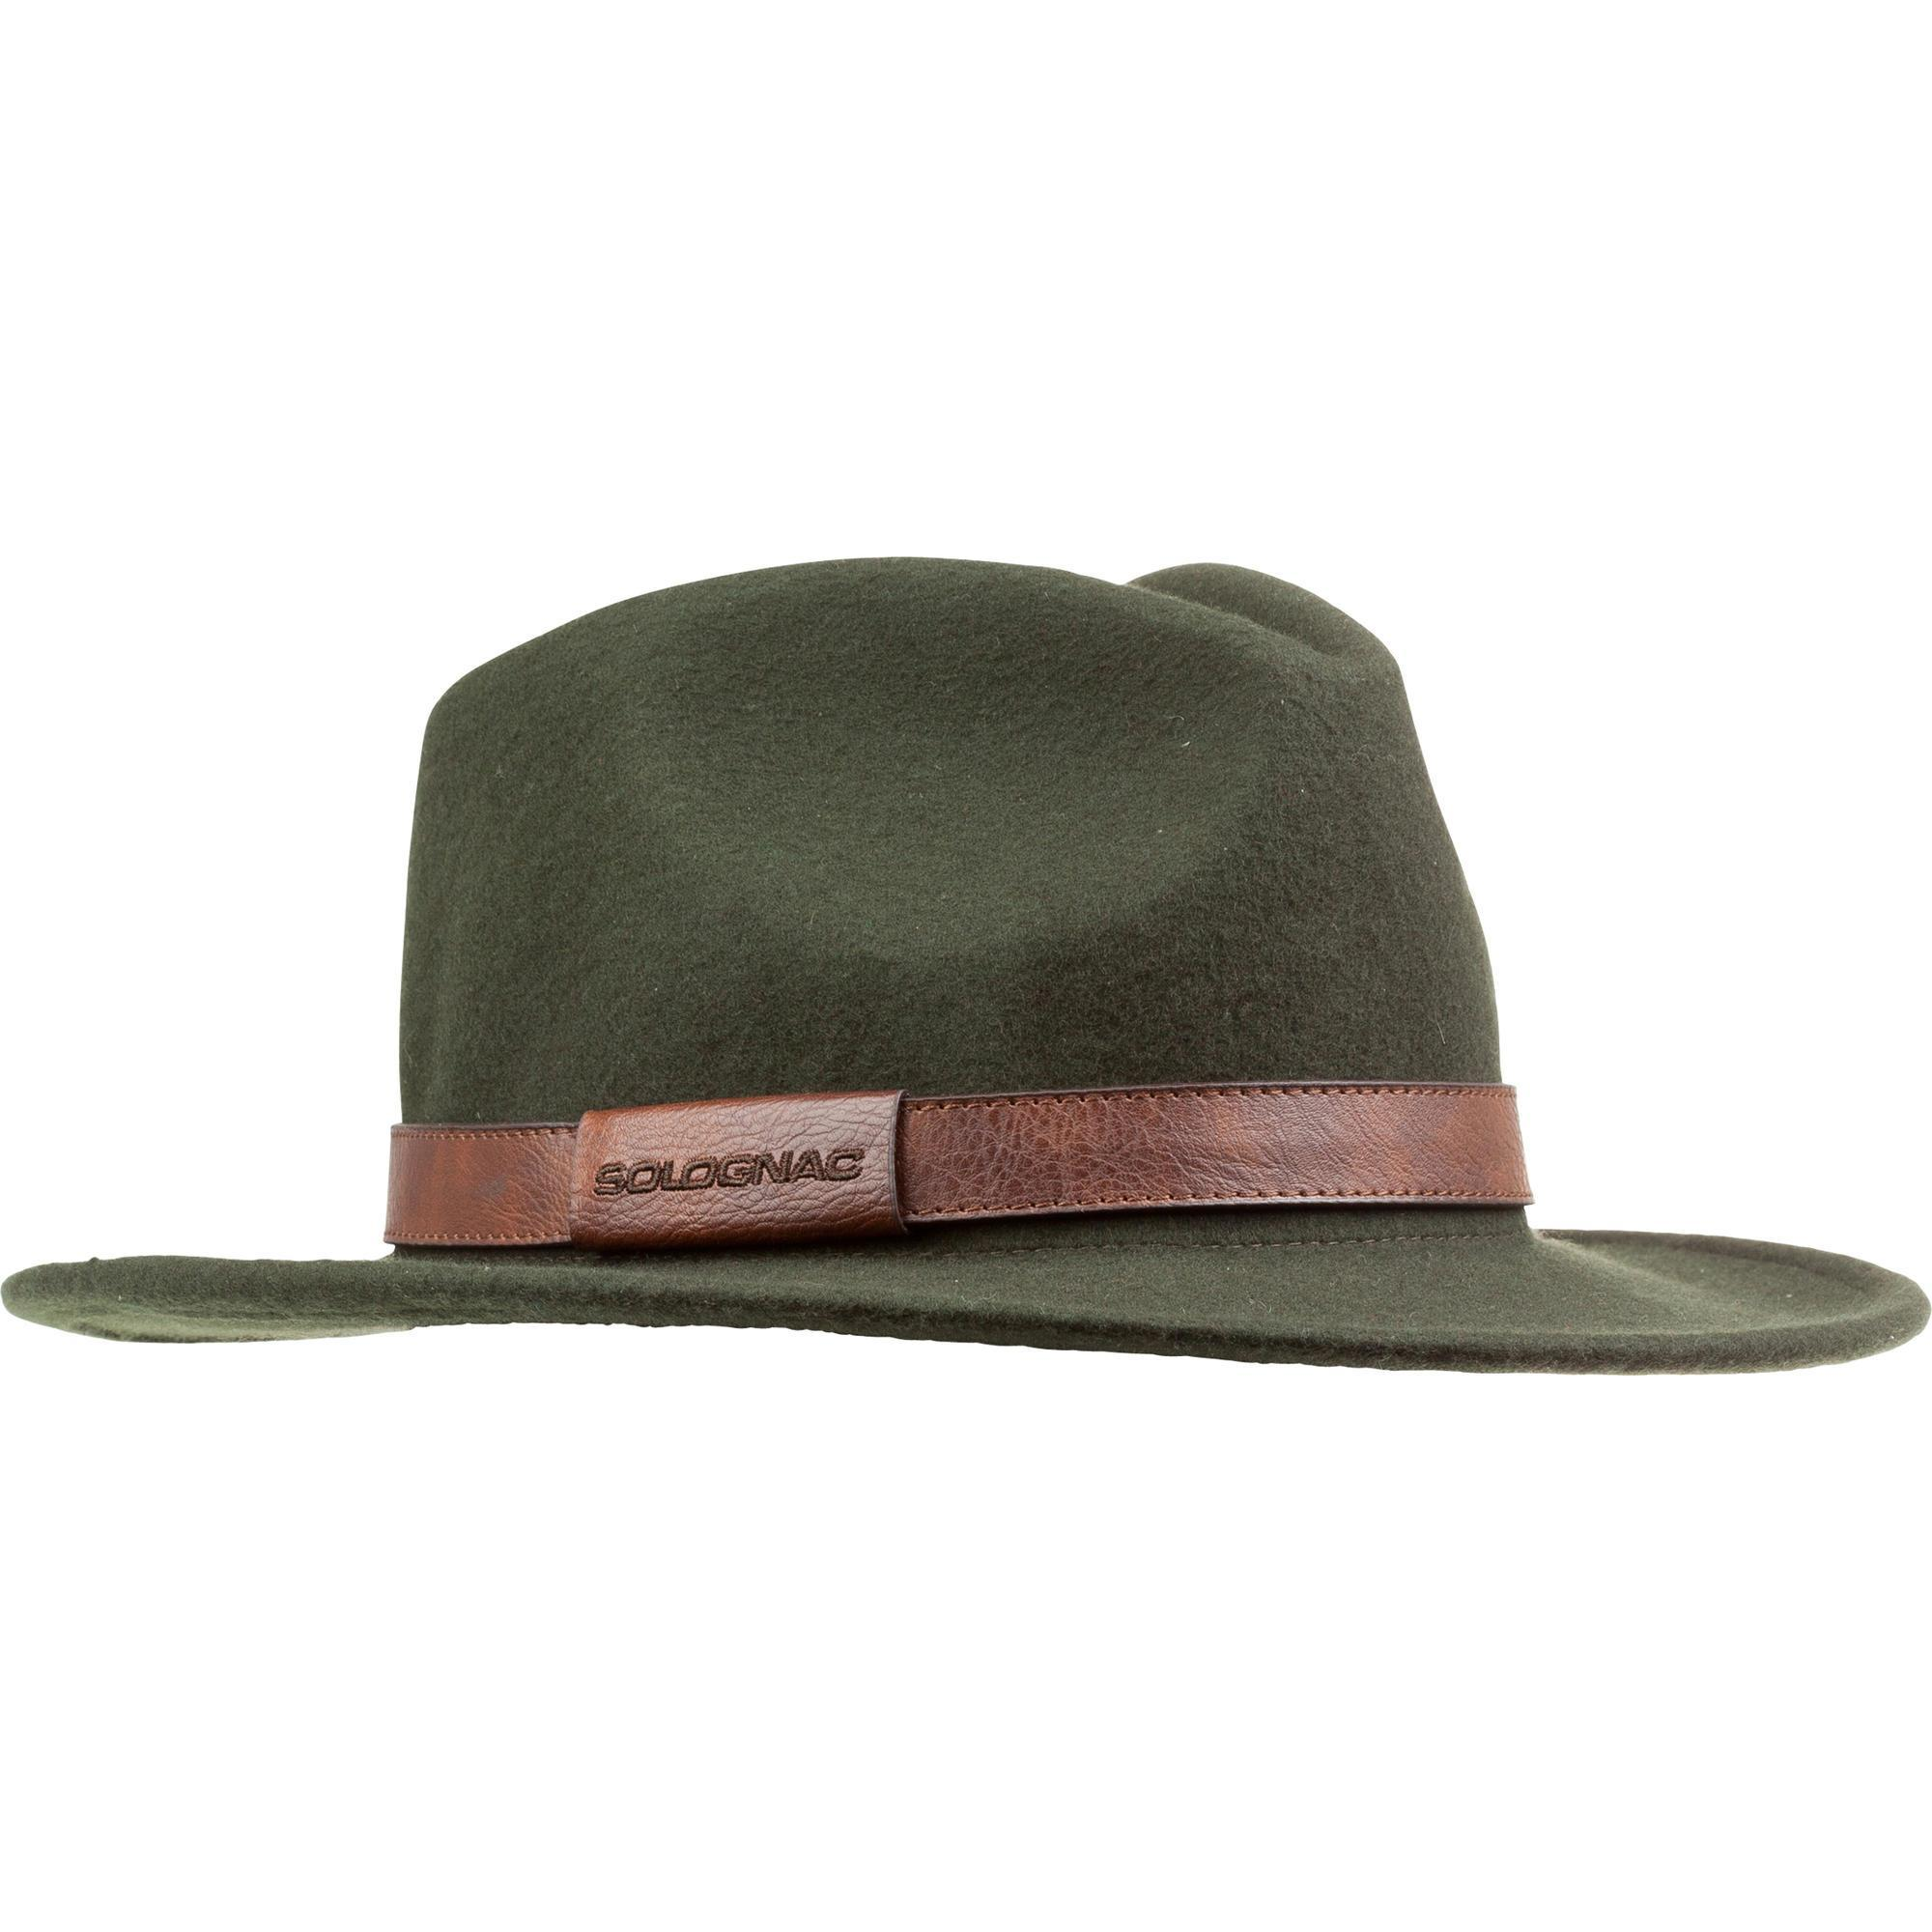 Jagd-Filzhut grün | Accessoires > Hüte > Filzhüte | Grün - Khaki | Solognac